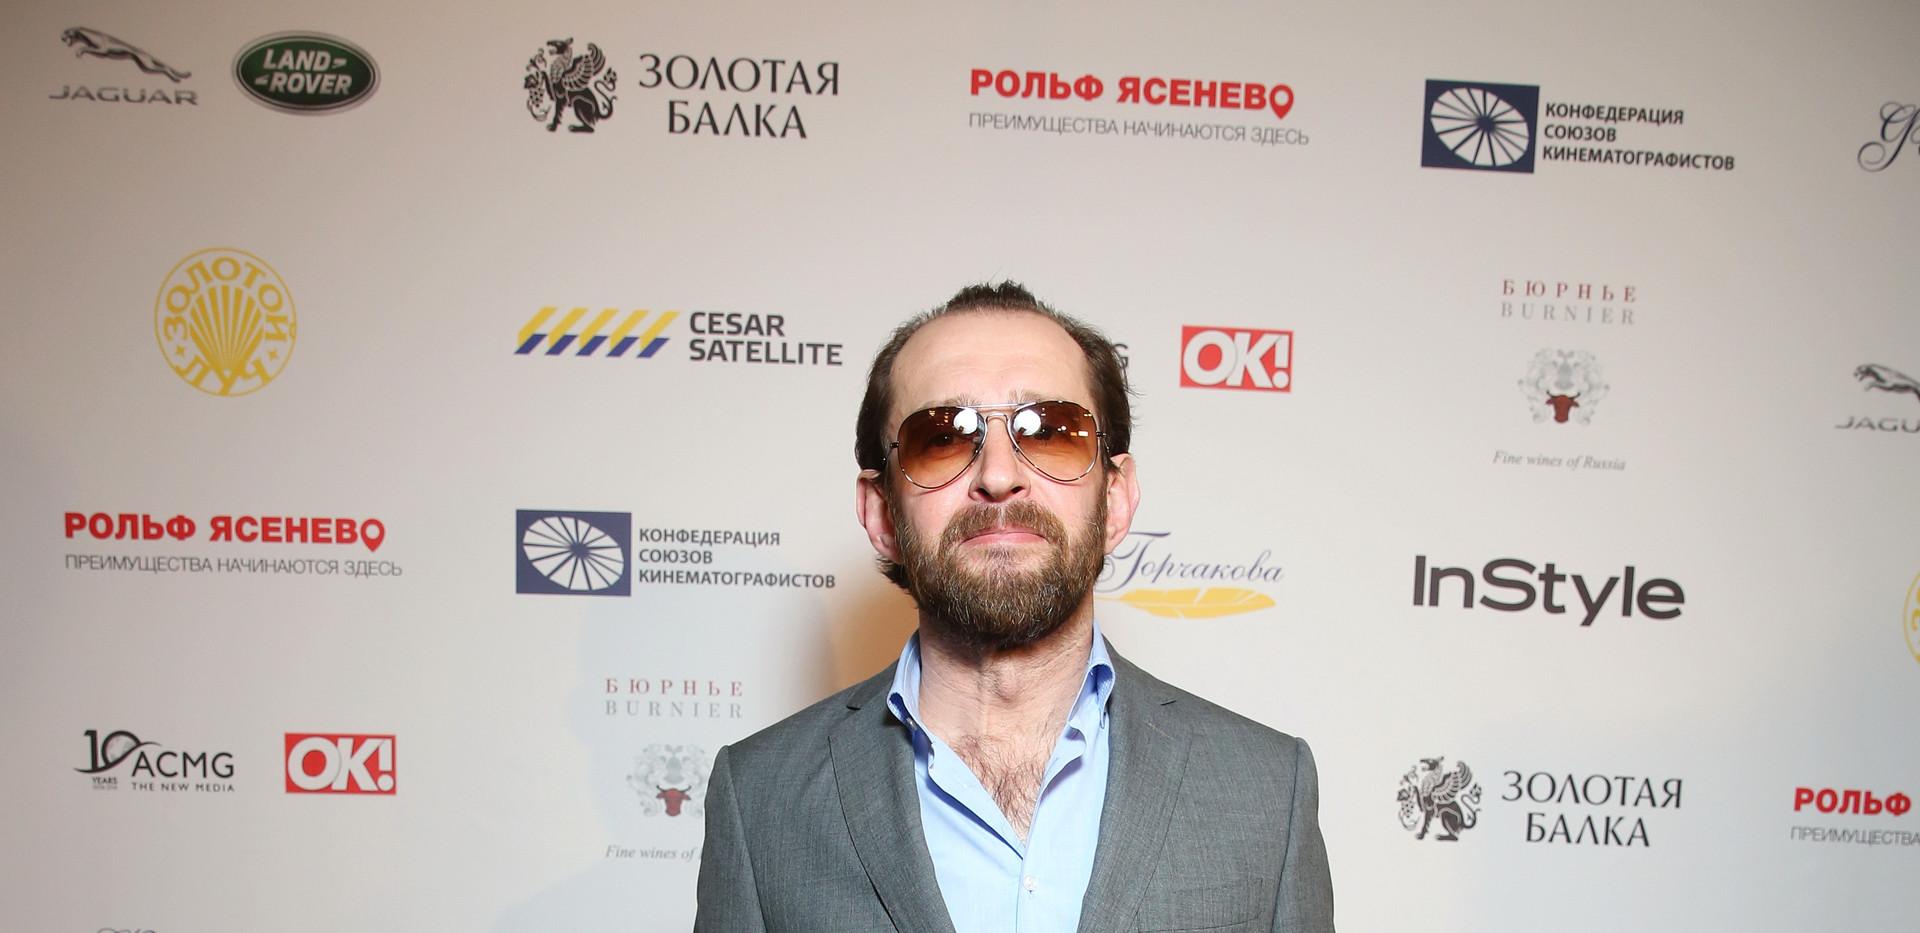 Константин Хабенский.JPG